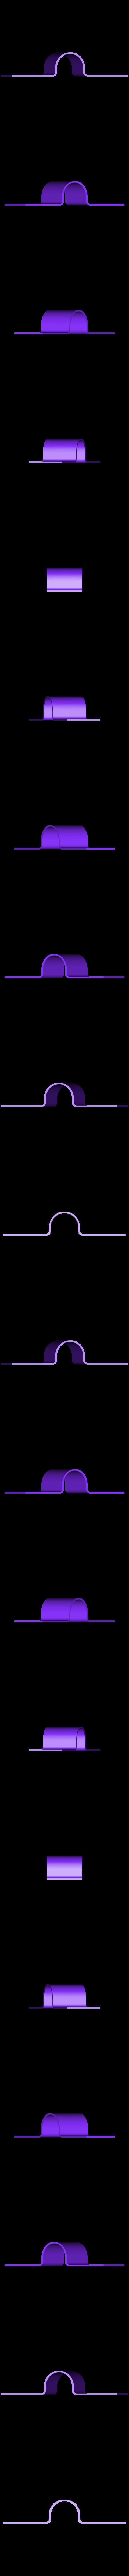 Splash Guard.stl Download free STL file WiFi Paddle Boat • 3D printing design, gzumwalt